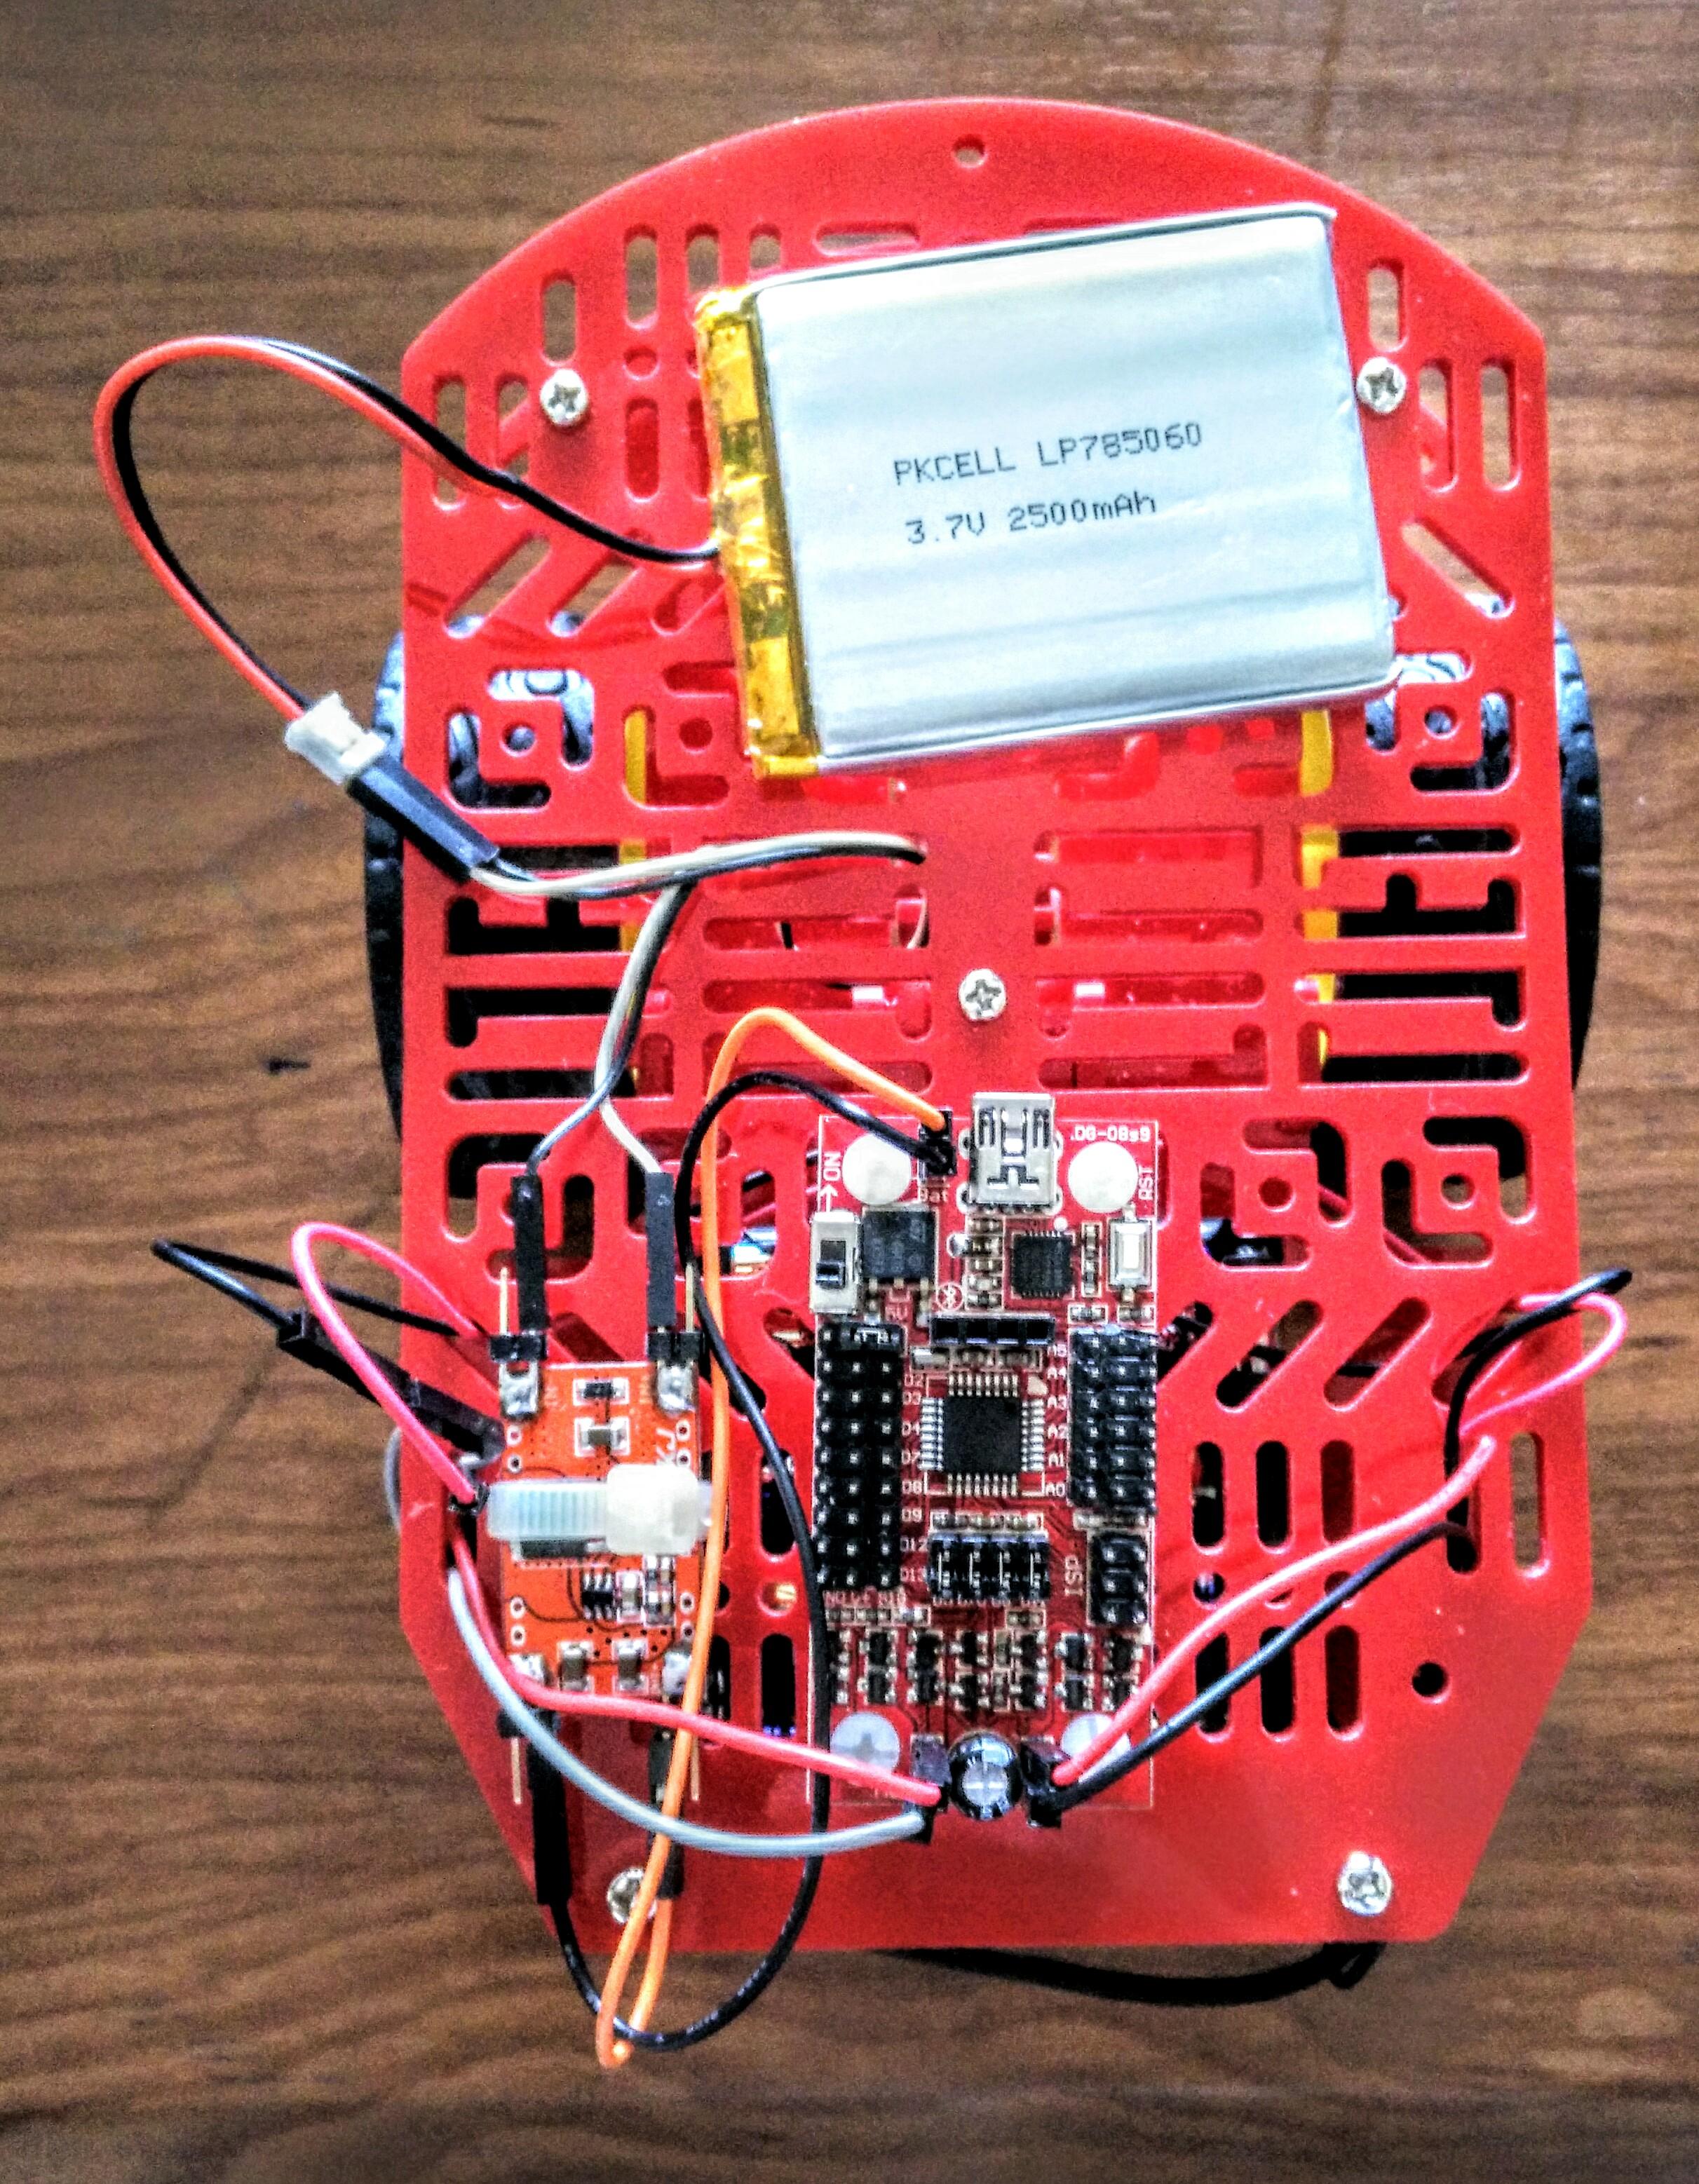 Robot de dos llantas y un micro-controlador S4A-EDU